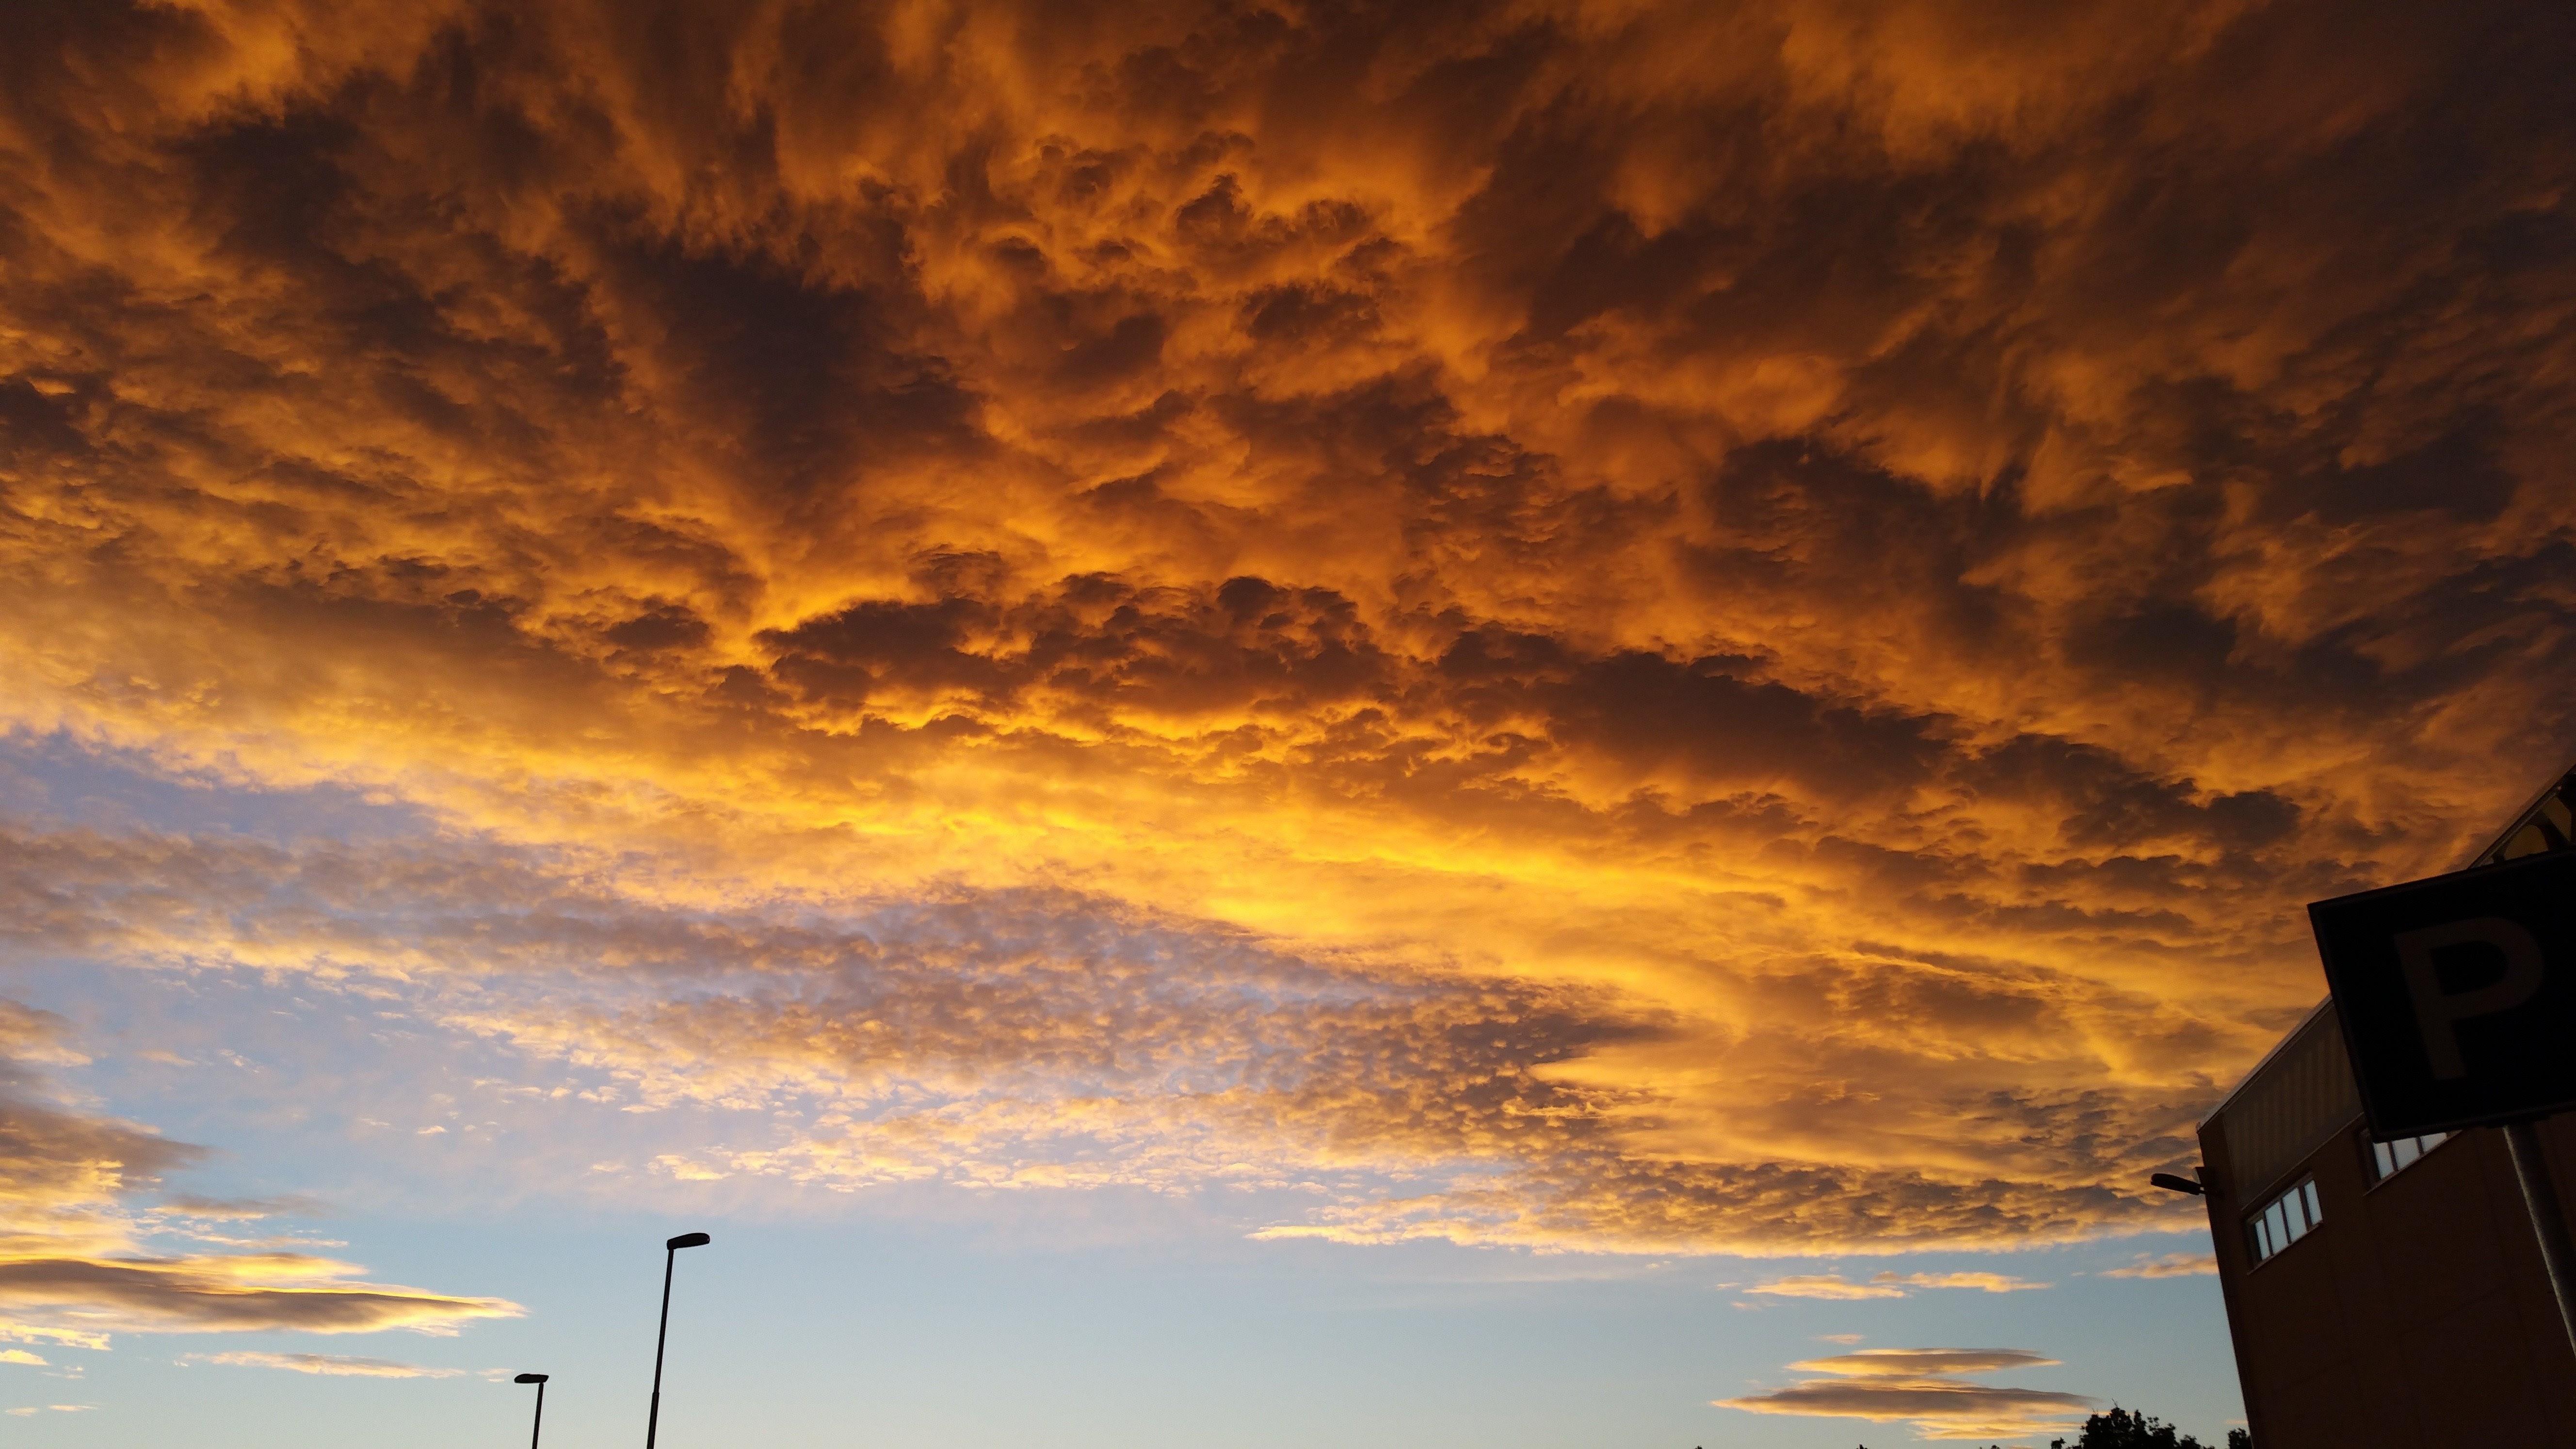 Free stock photo of dramatic sky, golden sunset, sky